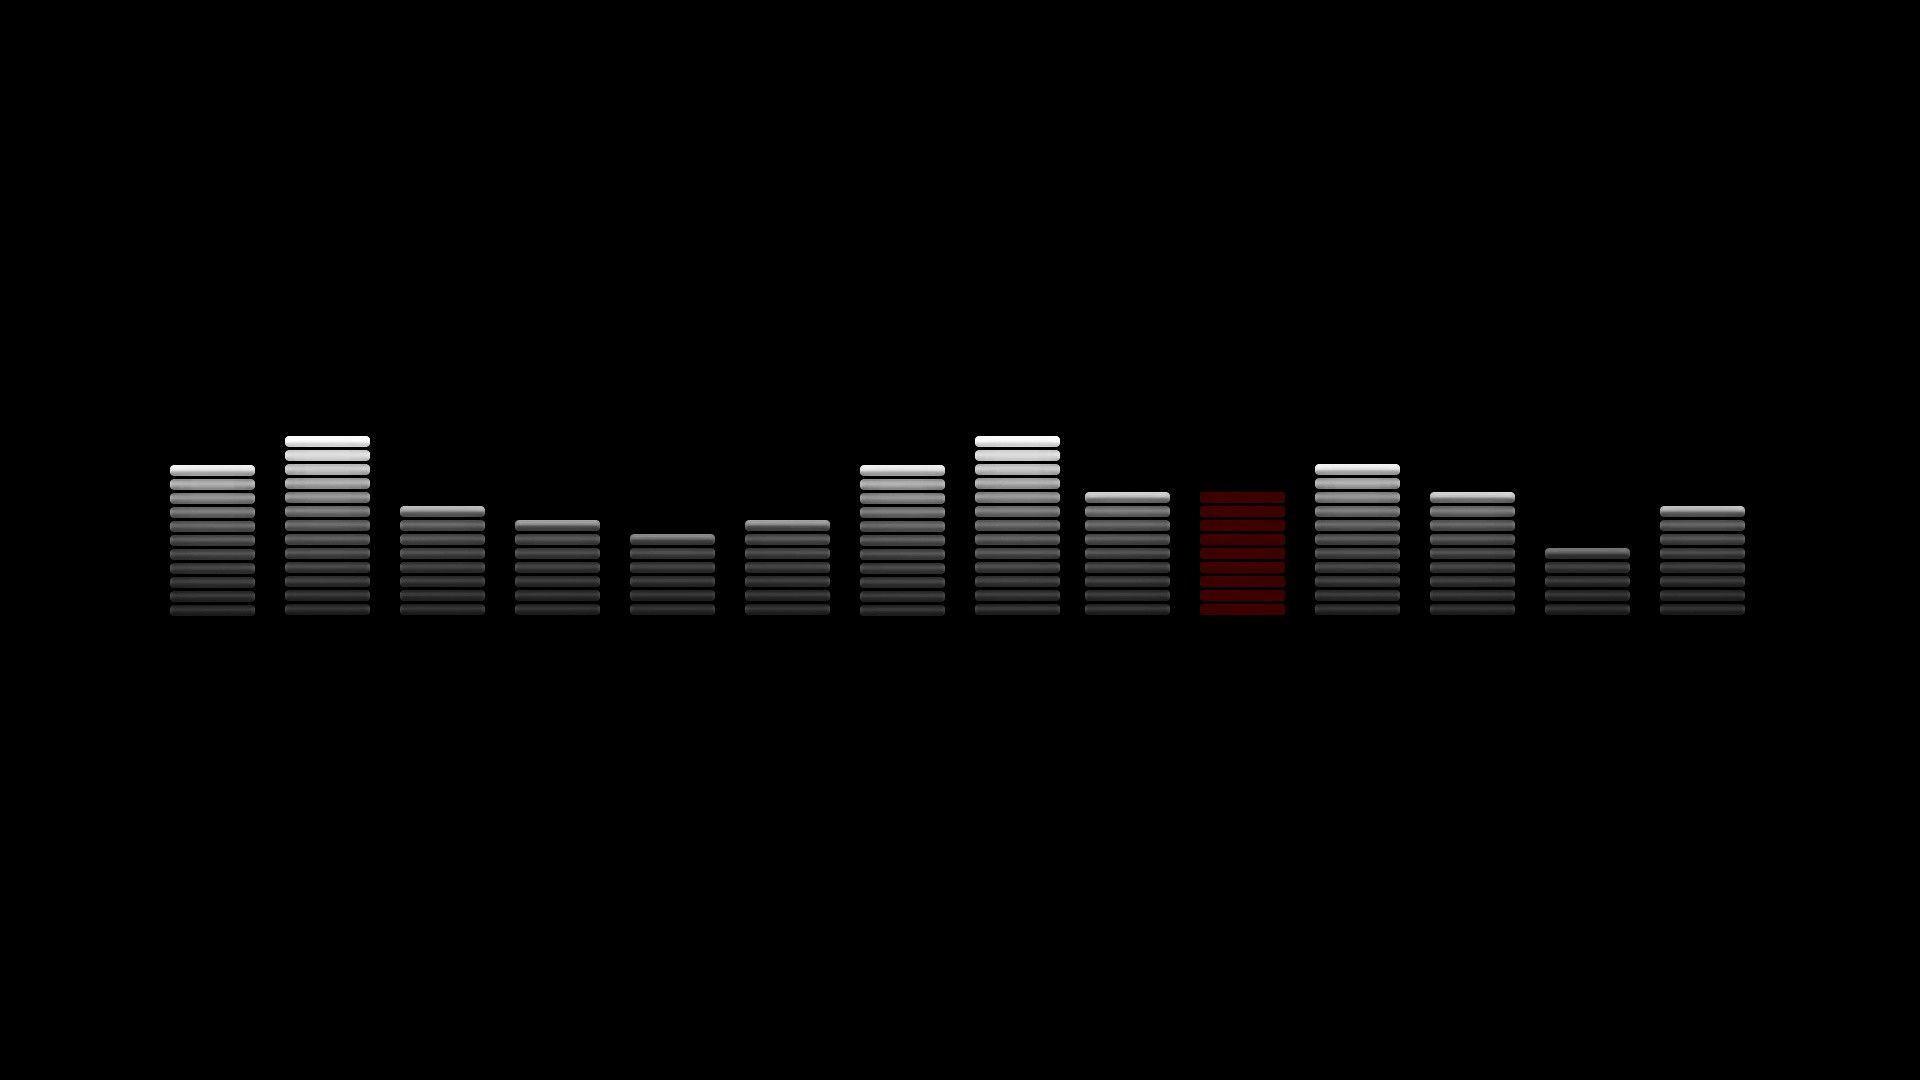 wallpaper.wiki-HD-Abstract-Music-Wallpaper-PIC-WPD0014244